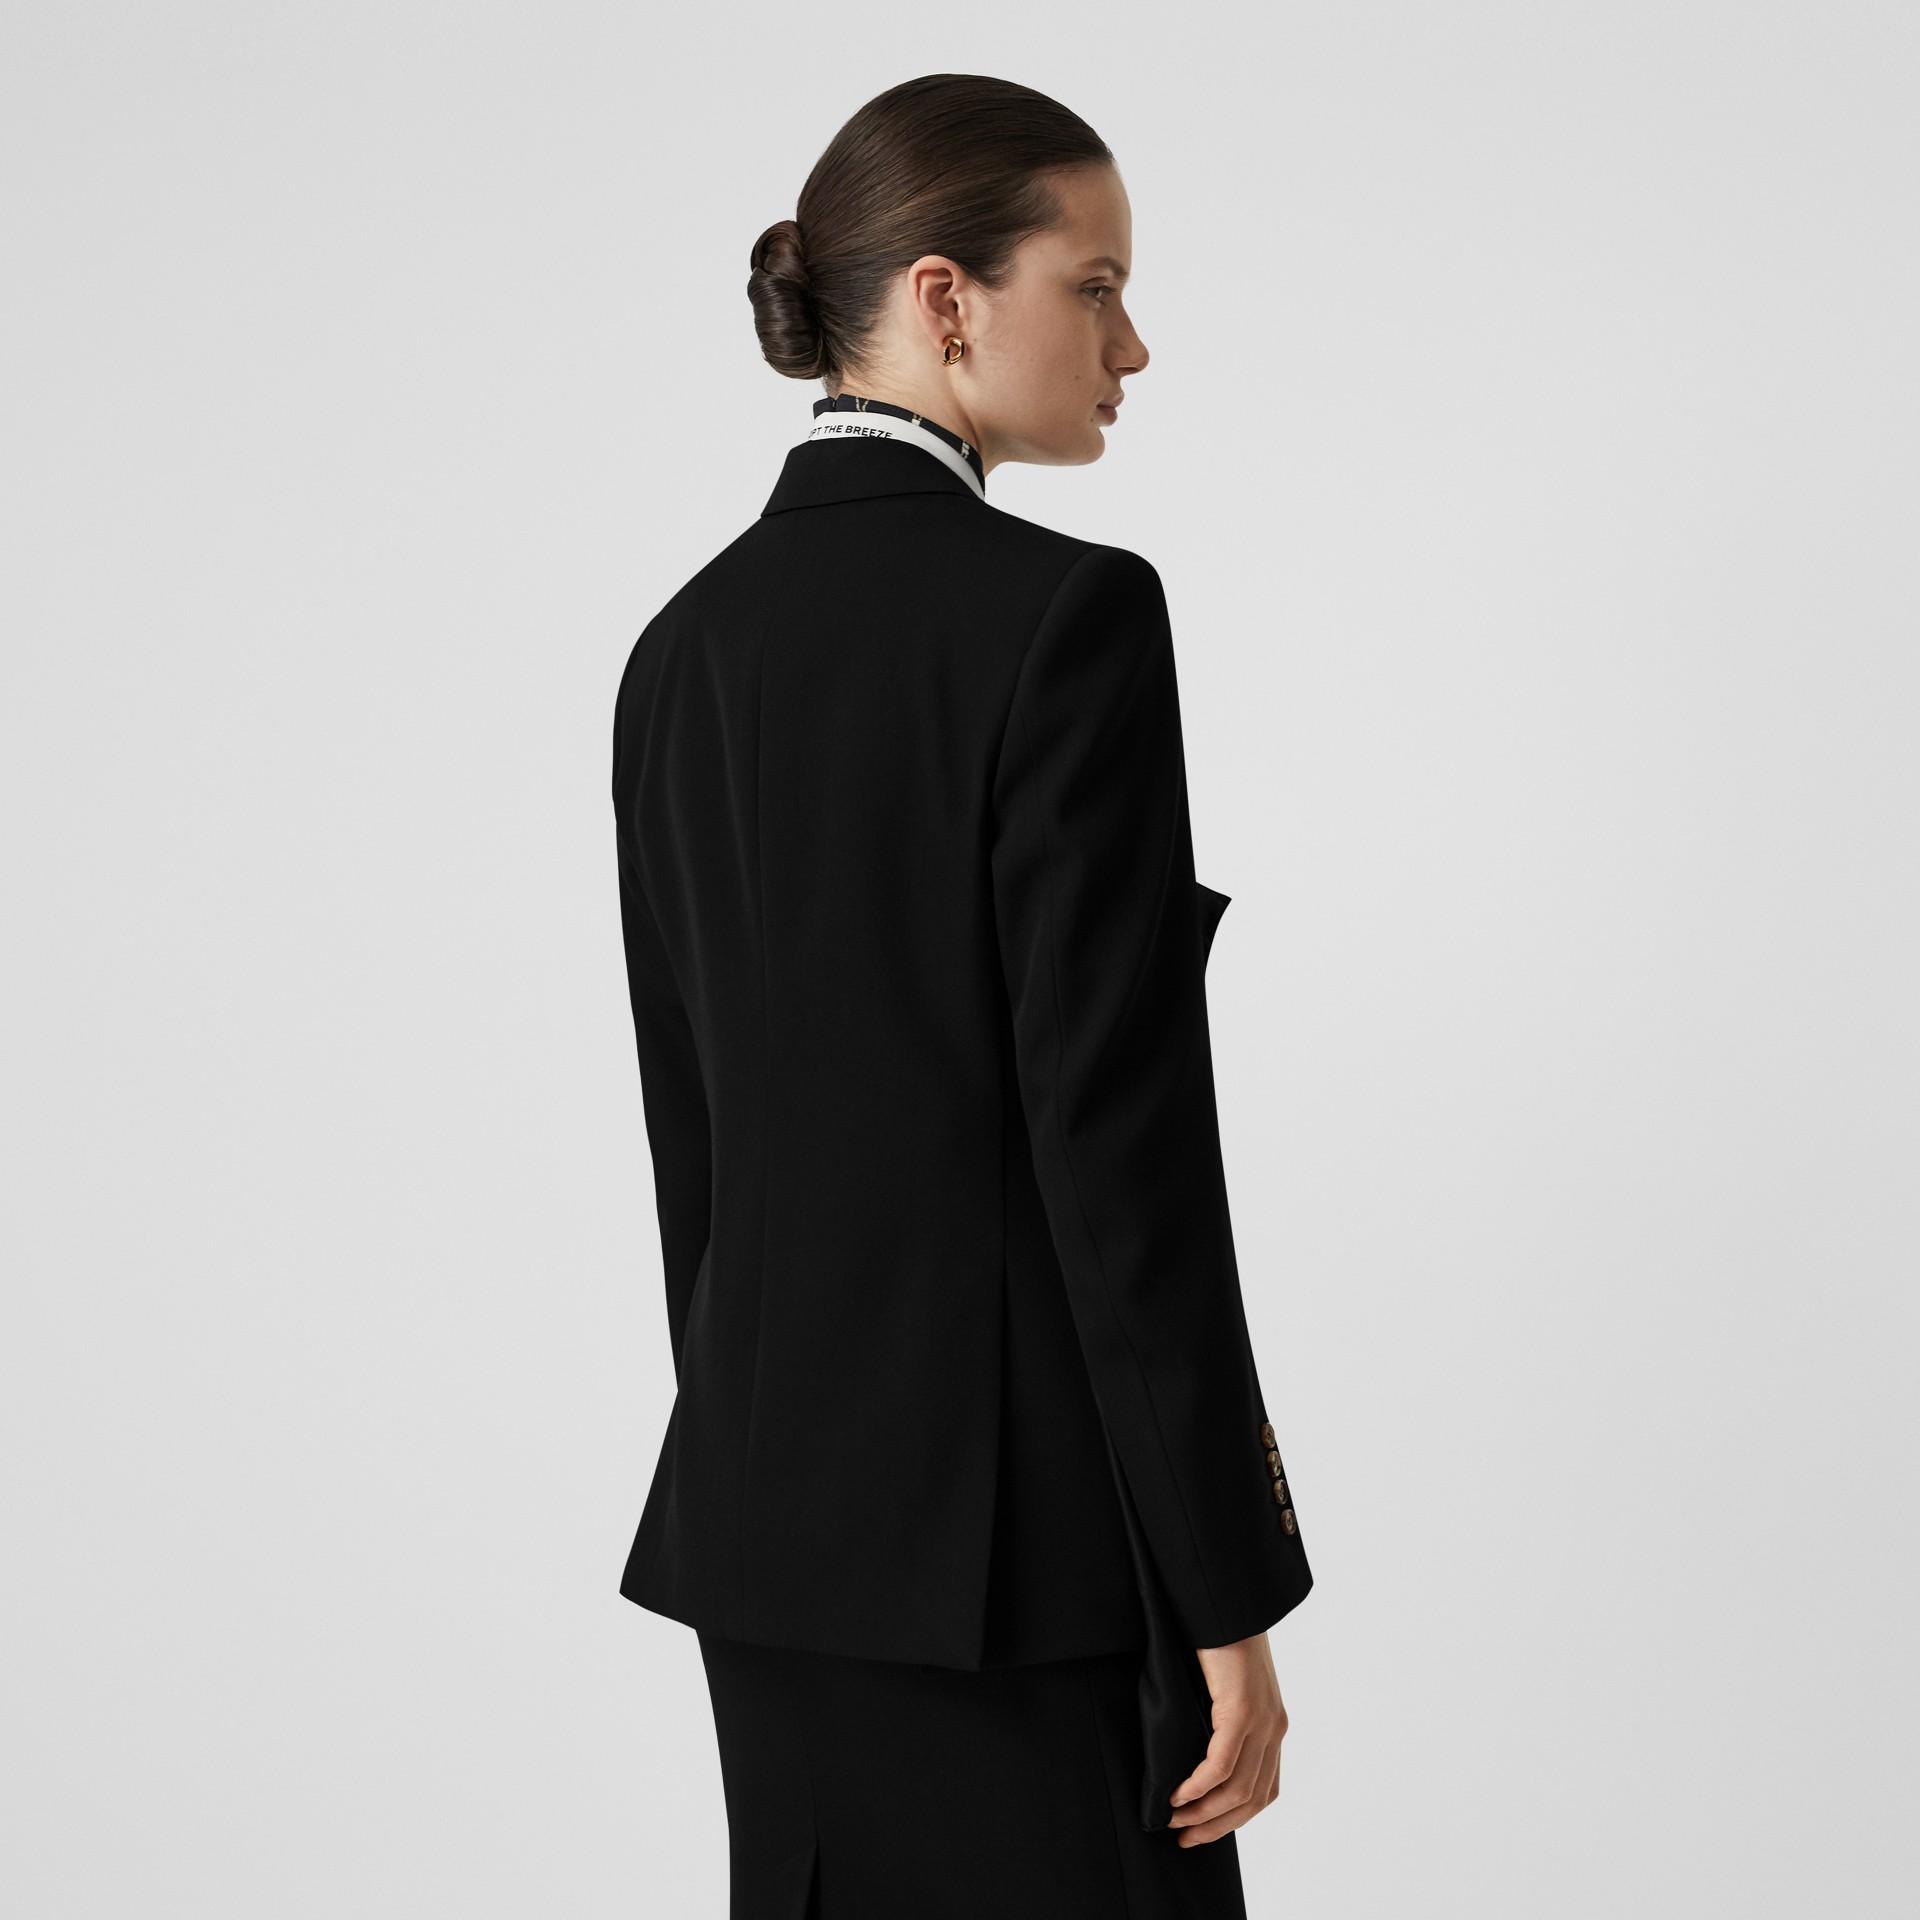 Logo Panel Detail Wool Tailored Jacket in Black - Women | Burberry Australia - gallery image 2